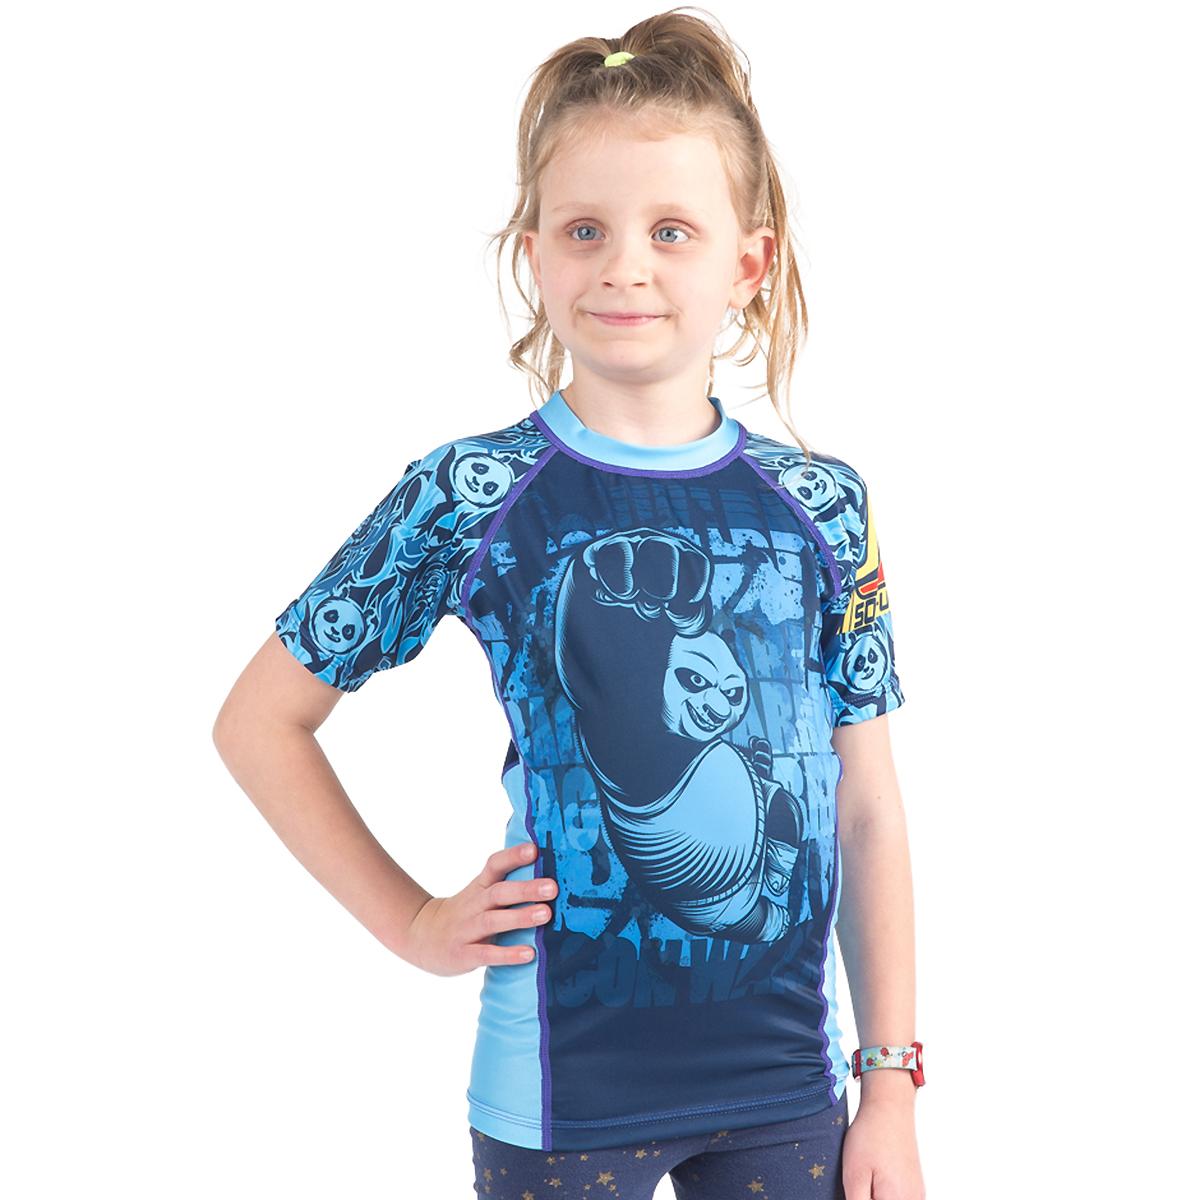 Fusion Fight Gear Kid's KFP Dragon Warrior Short Sleeve Rashguard - Blue